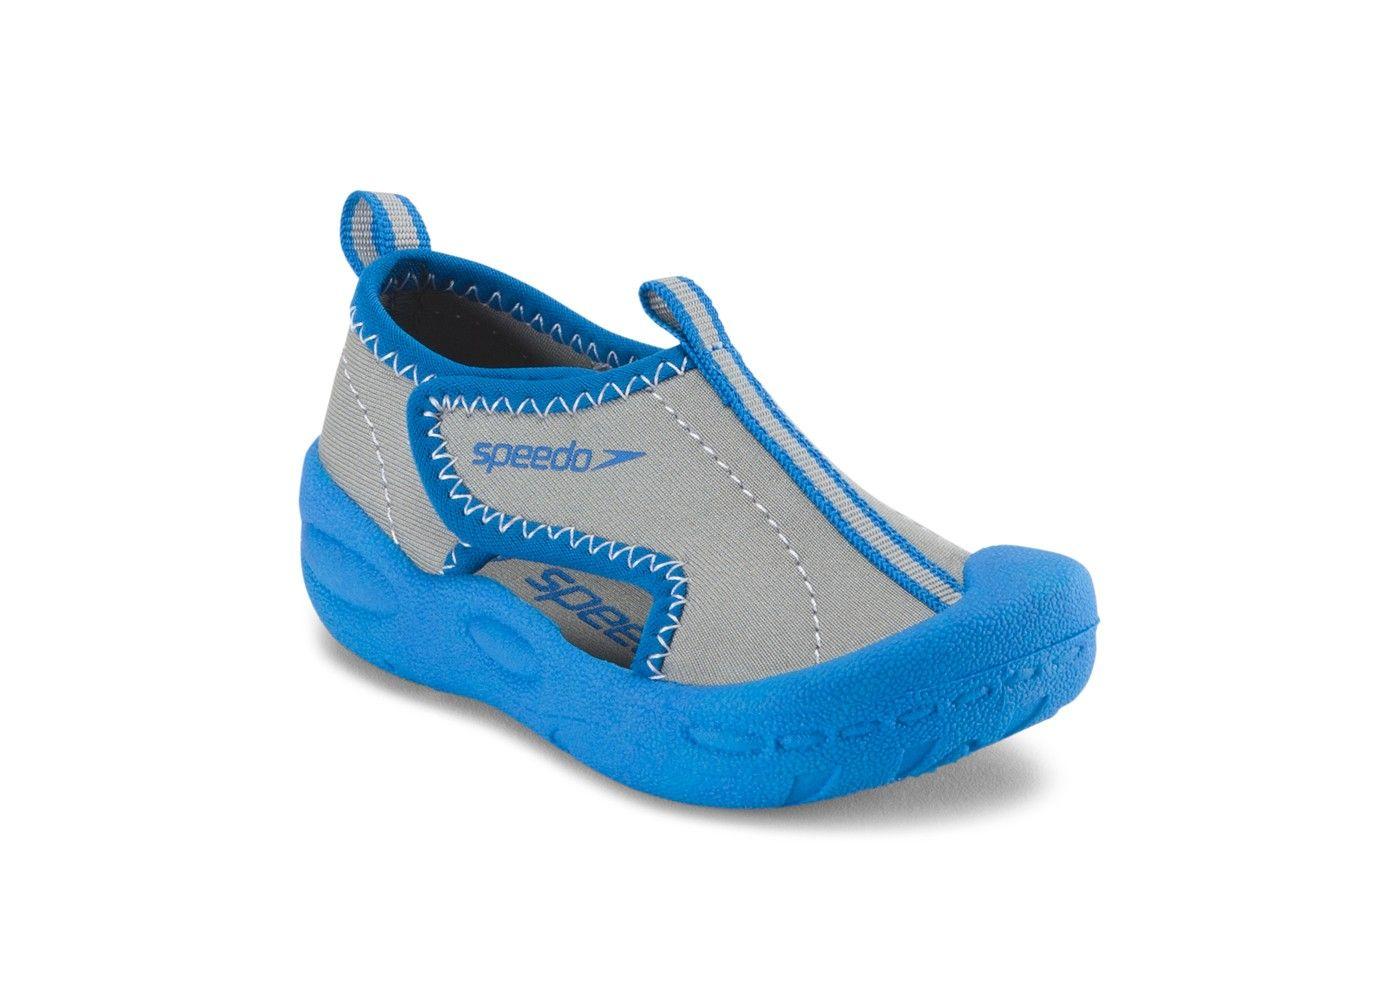 Speedo Toddler Boys' Hybrid Water Shoes